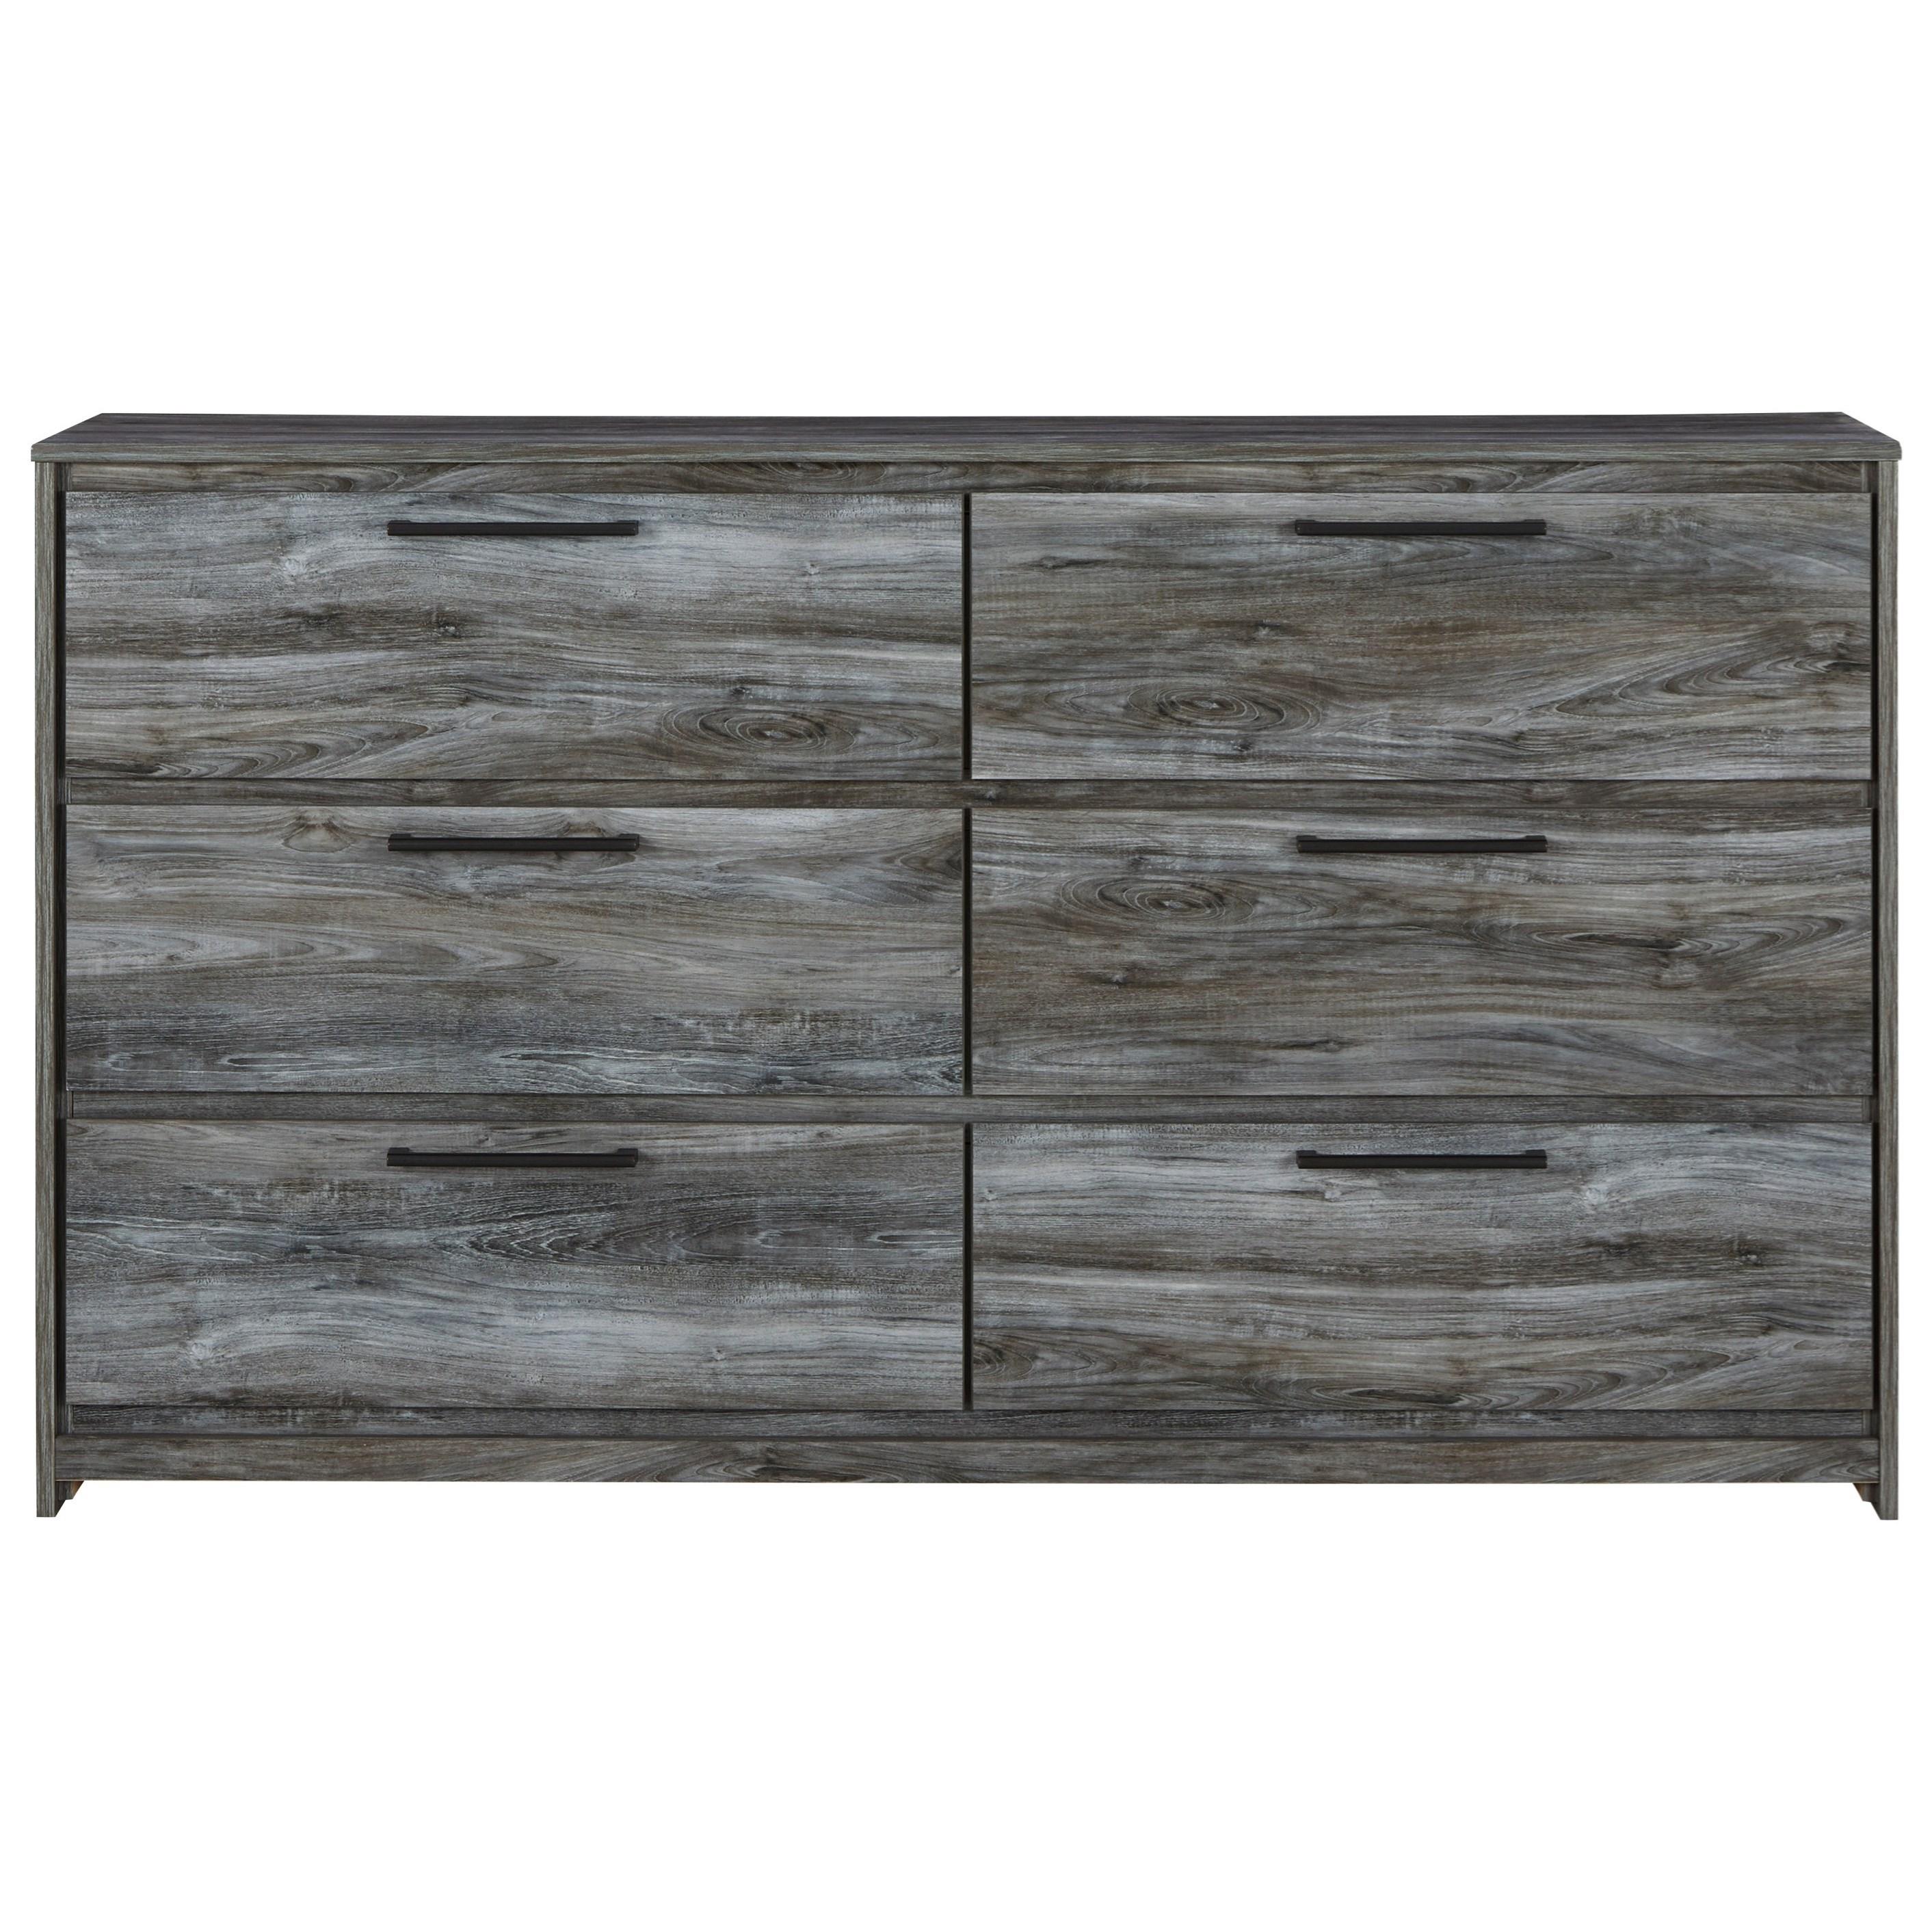 Baystorm Dresser by Ashley (Signature Design) at Johnny Janosik